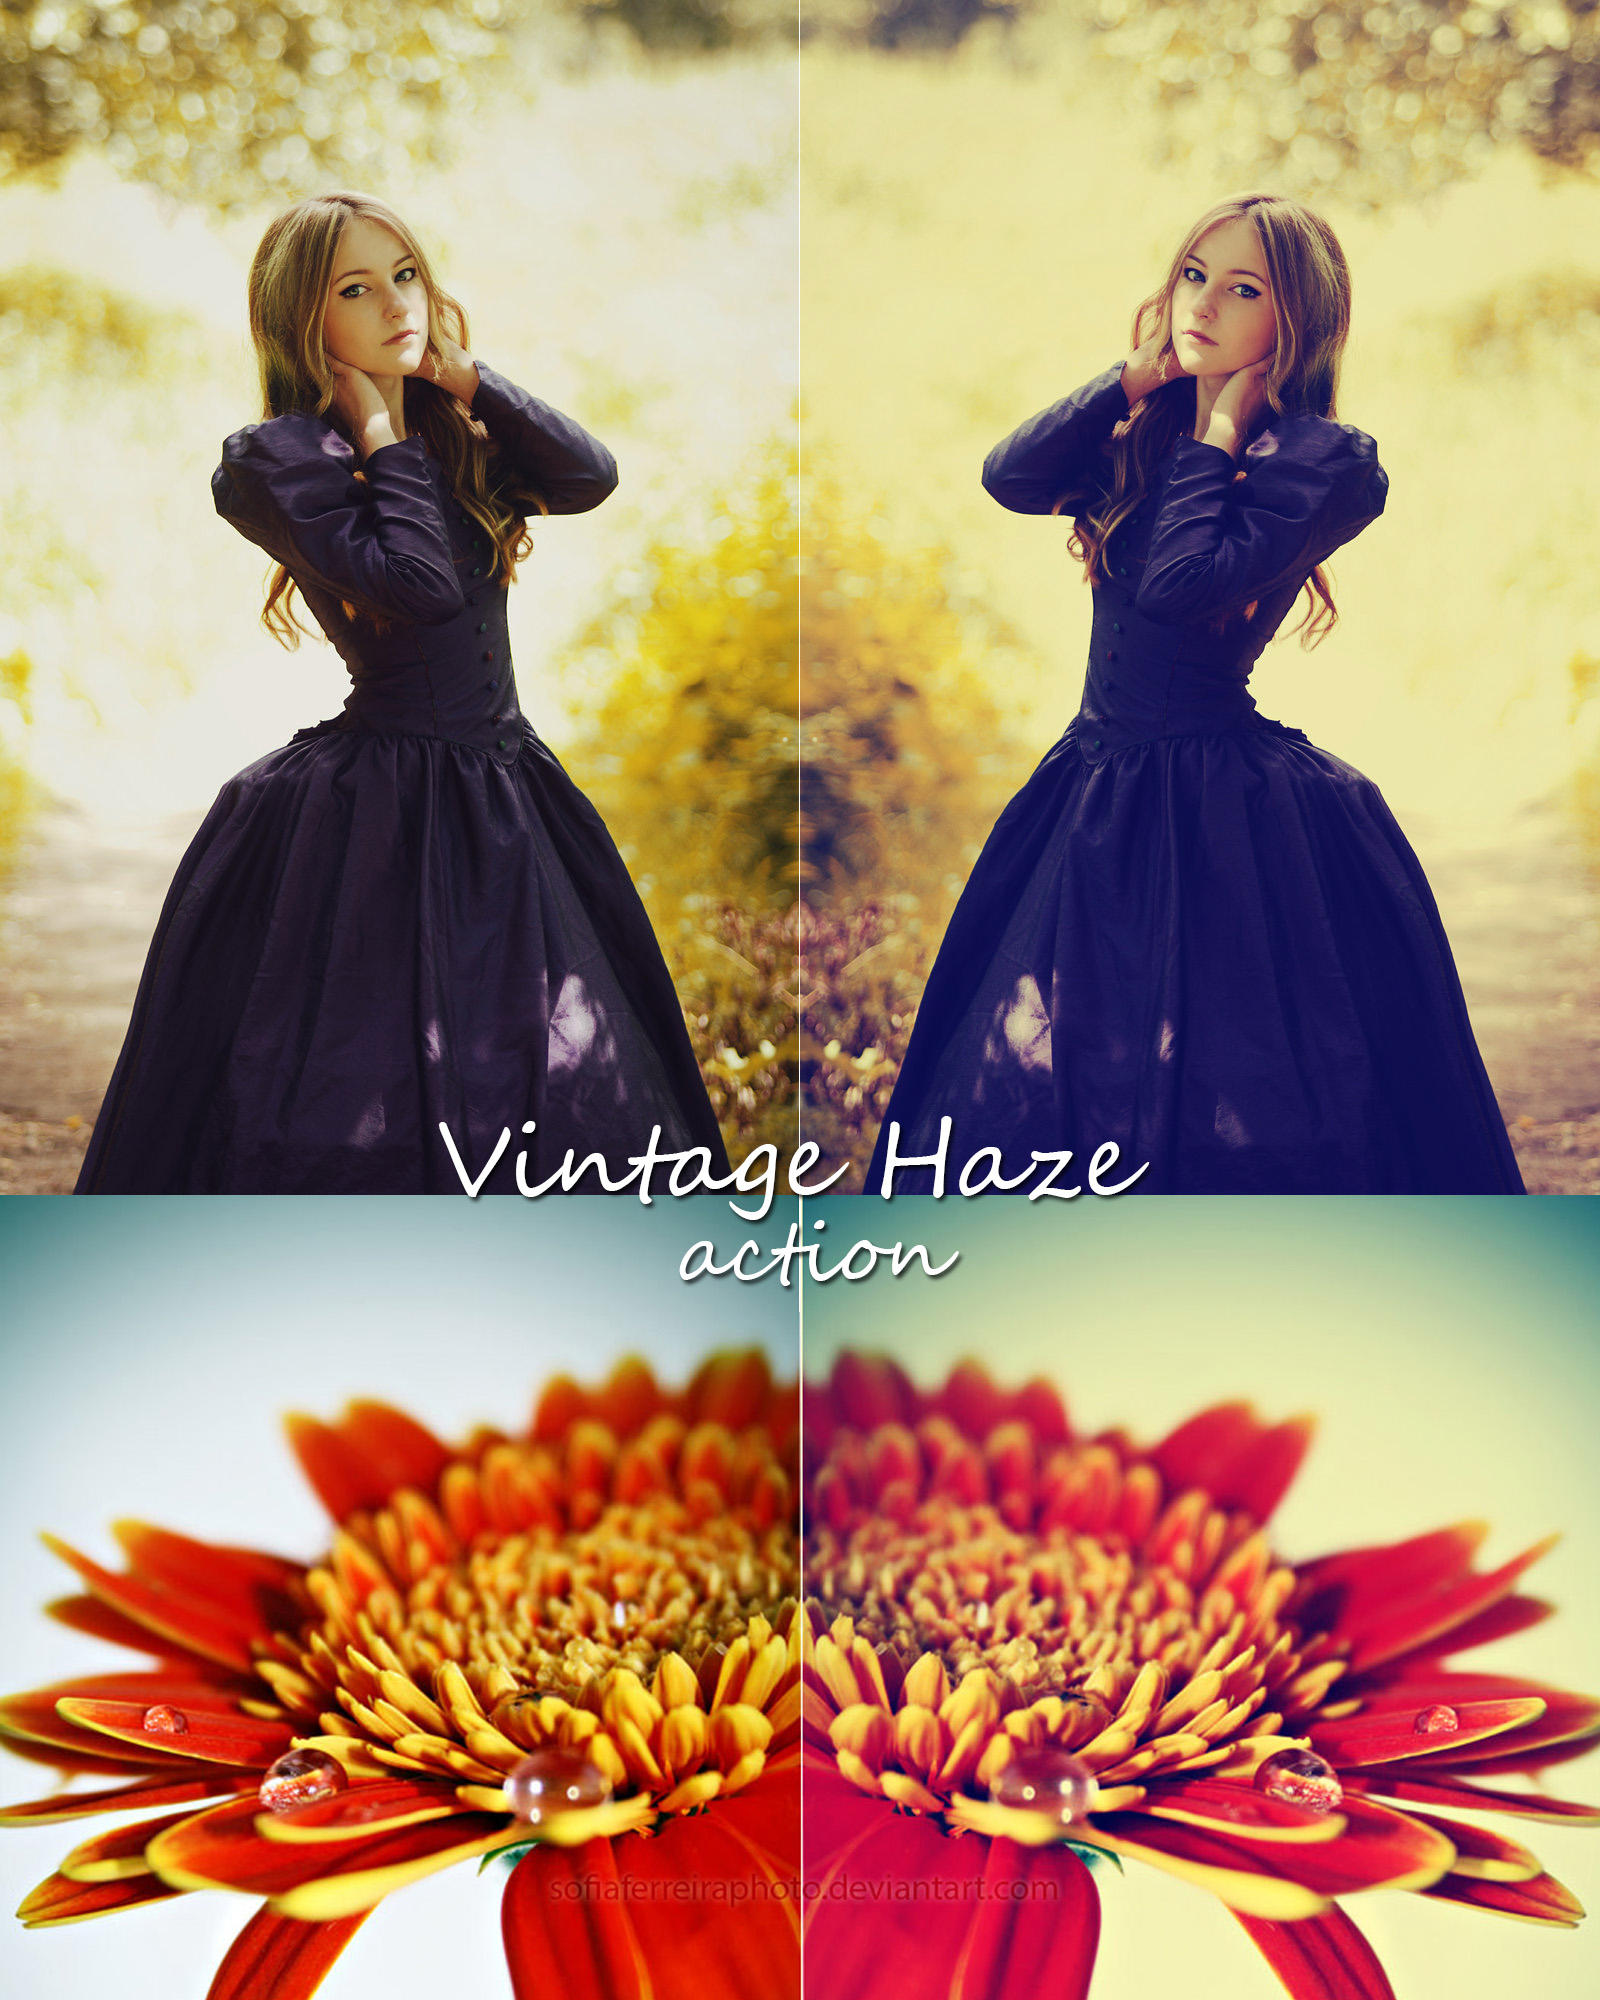 Vintage Haze - Photoshop action by sofiaferreiraphoto